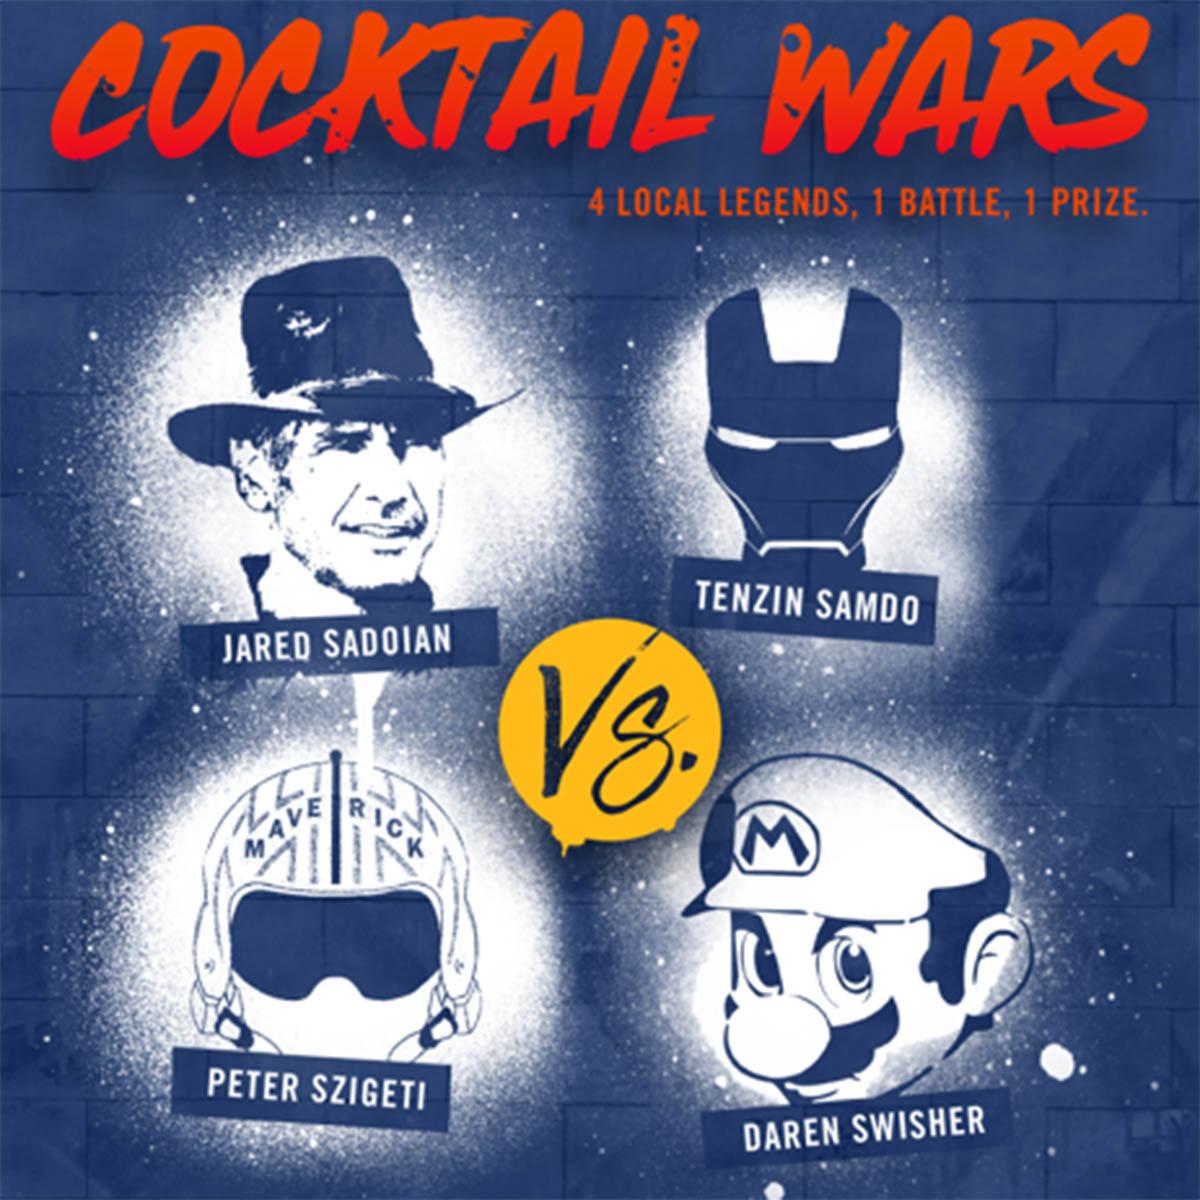 Cocktail Wars 2015 flyer